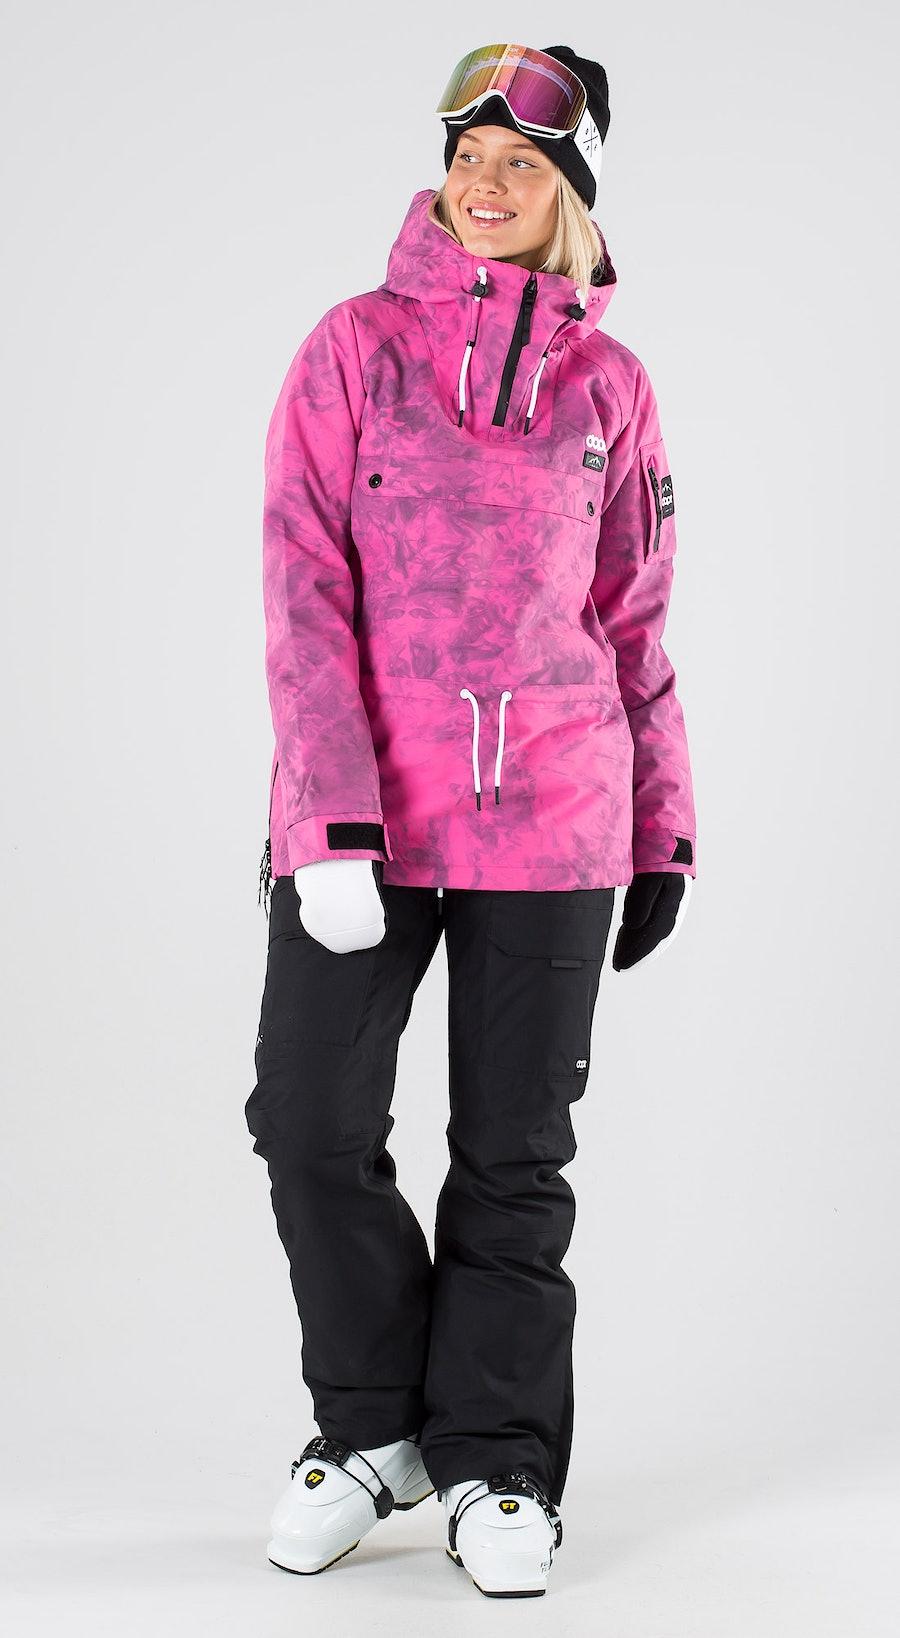 Dope Annok W Pink Tiedye Ski clothing Multi